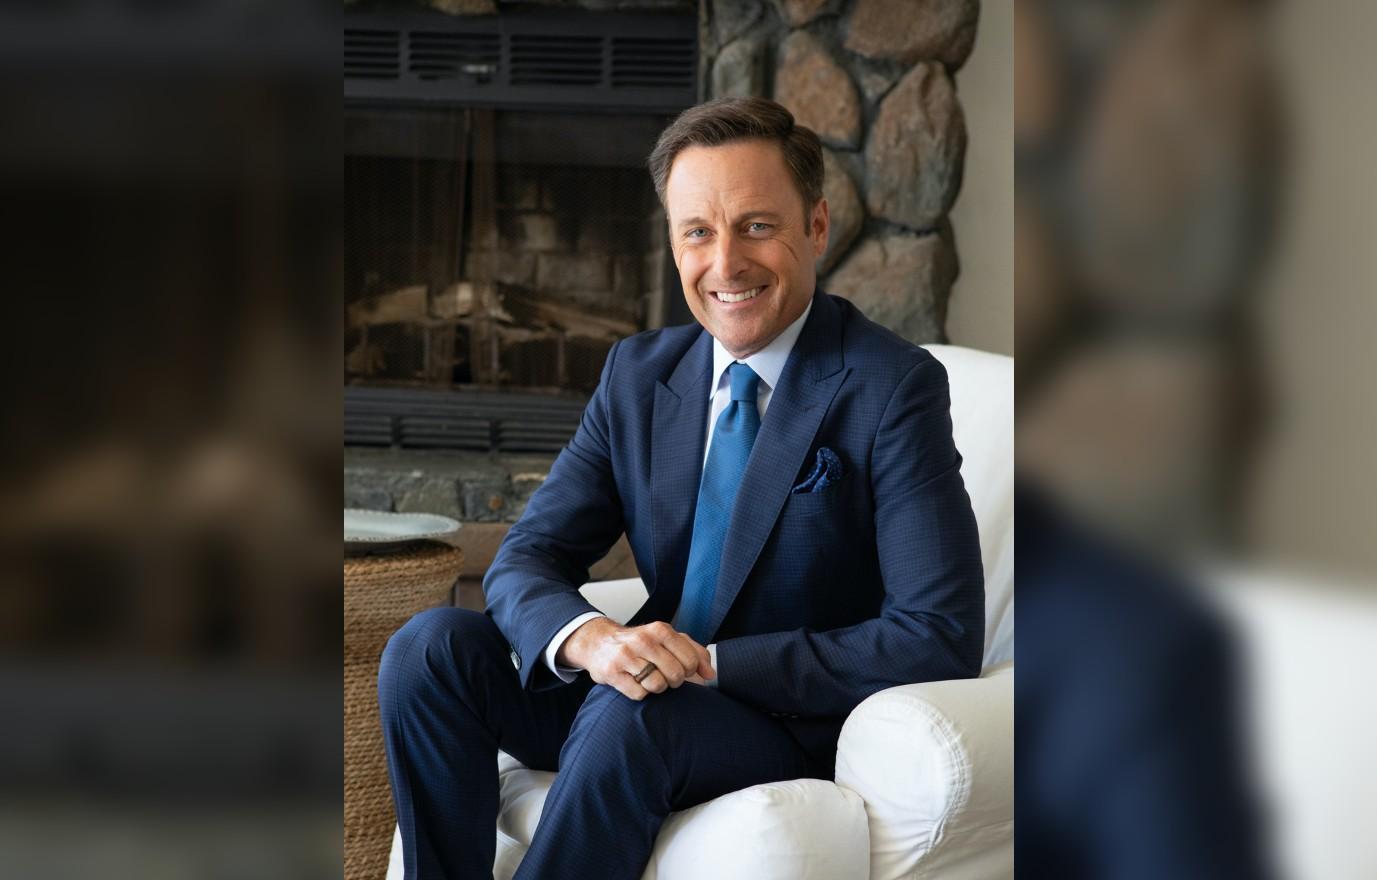 bachelor host chris harrison asked  million only got  million exit scandal celebrity hollywood reality tv